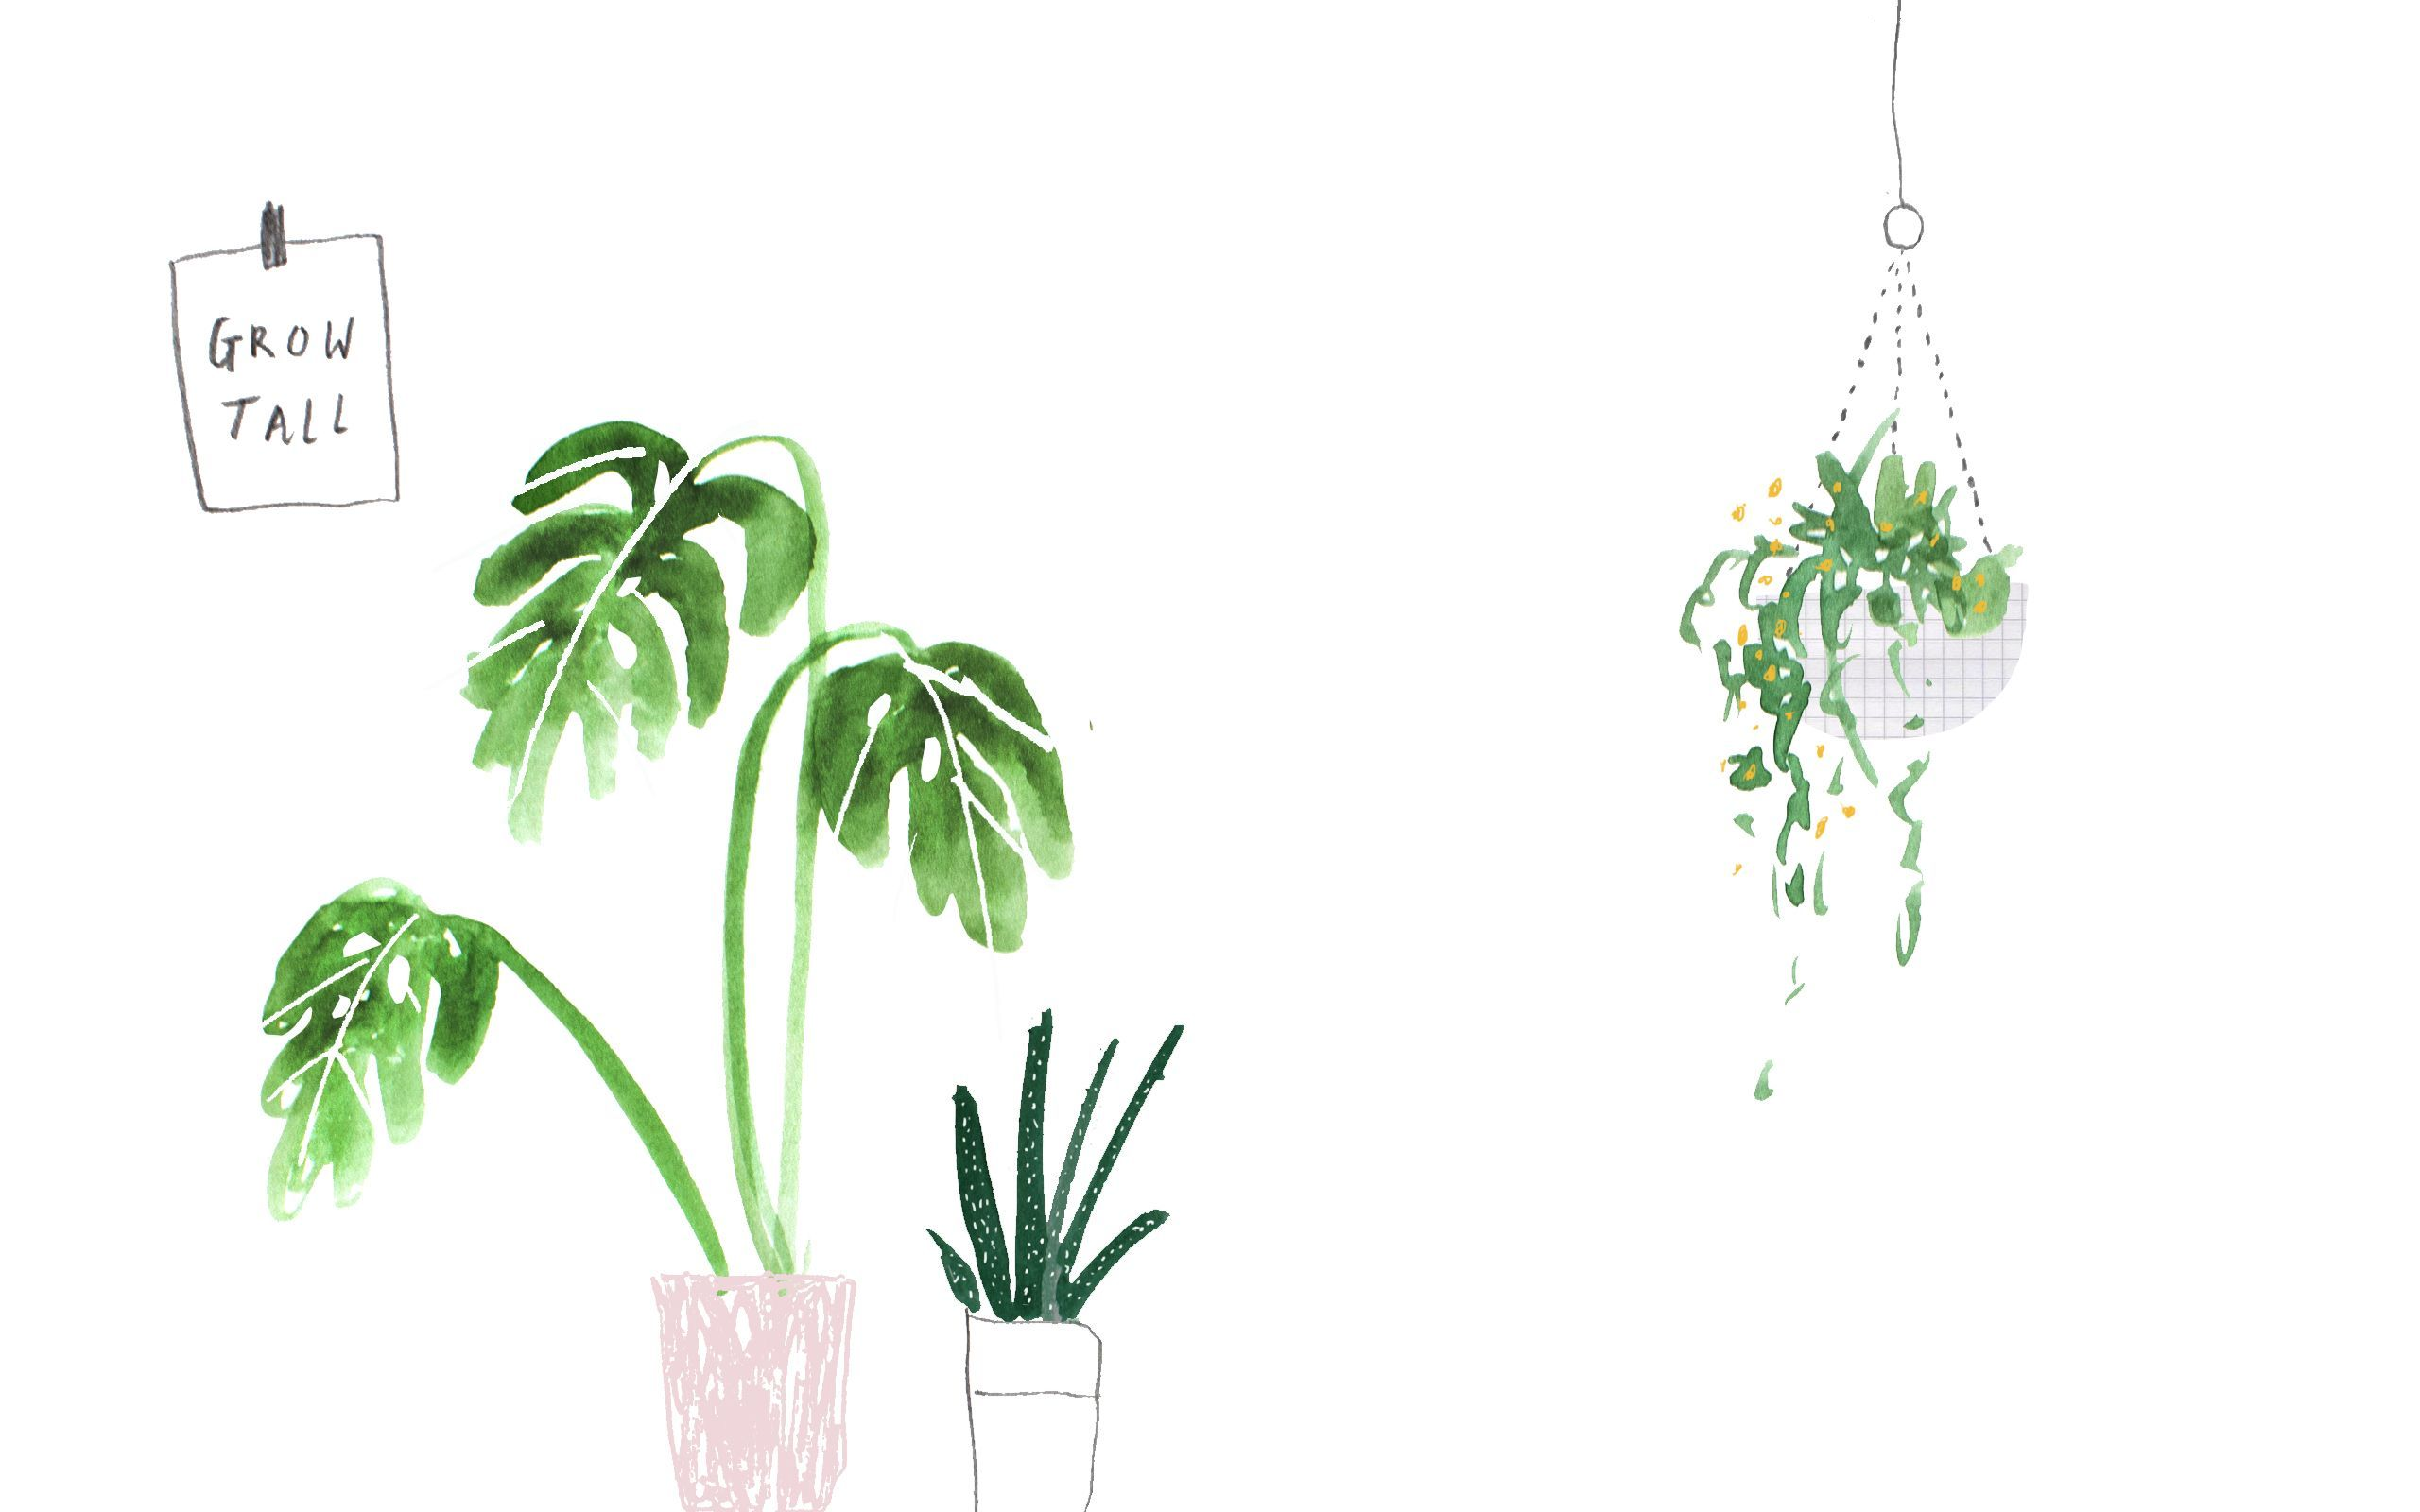 Plants Laptop Wallpapers Top Free Plants Laptop Backgrounds Wallpaperaccess